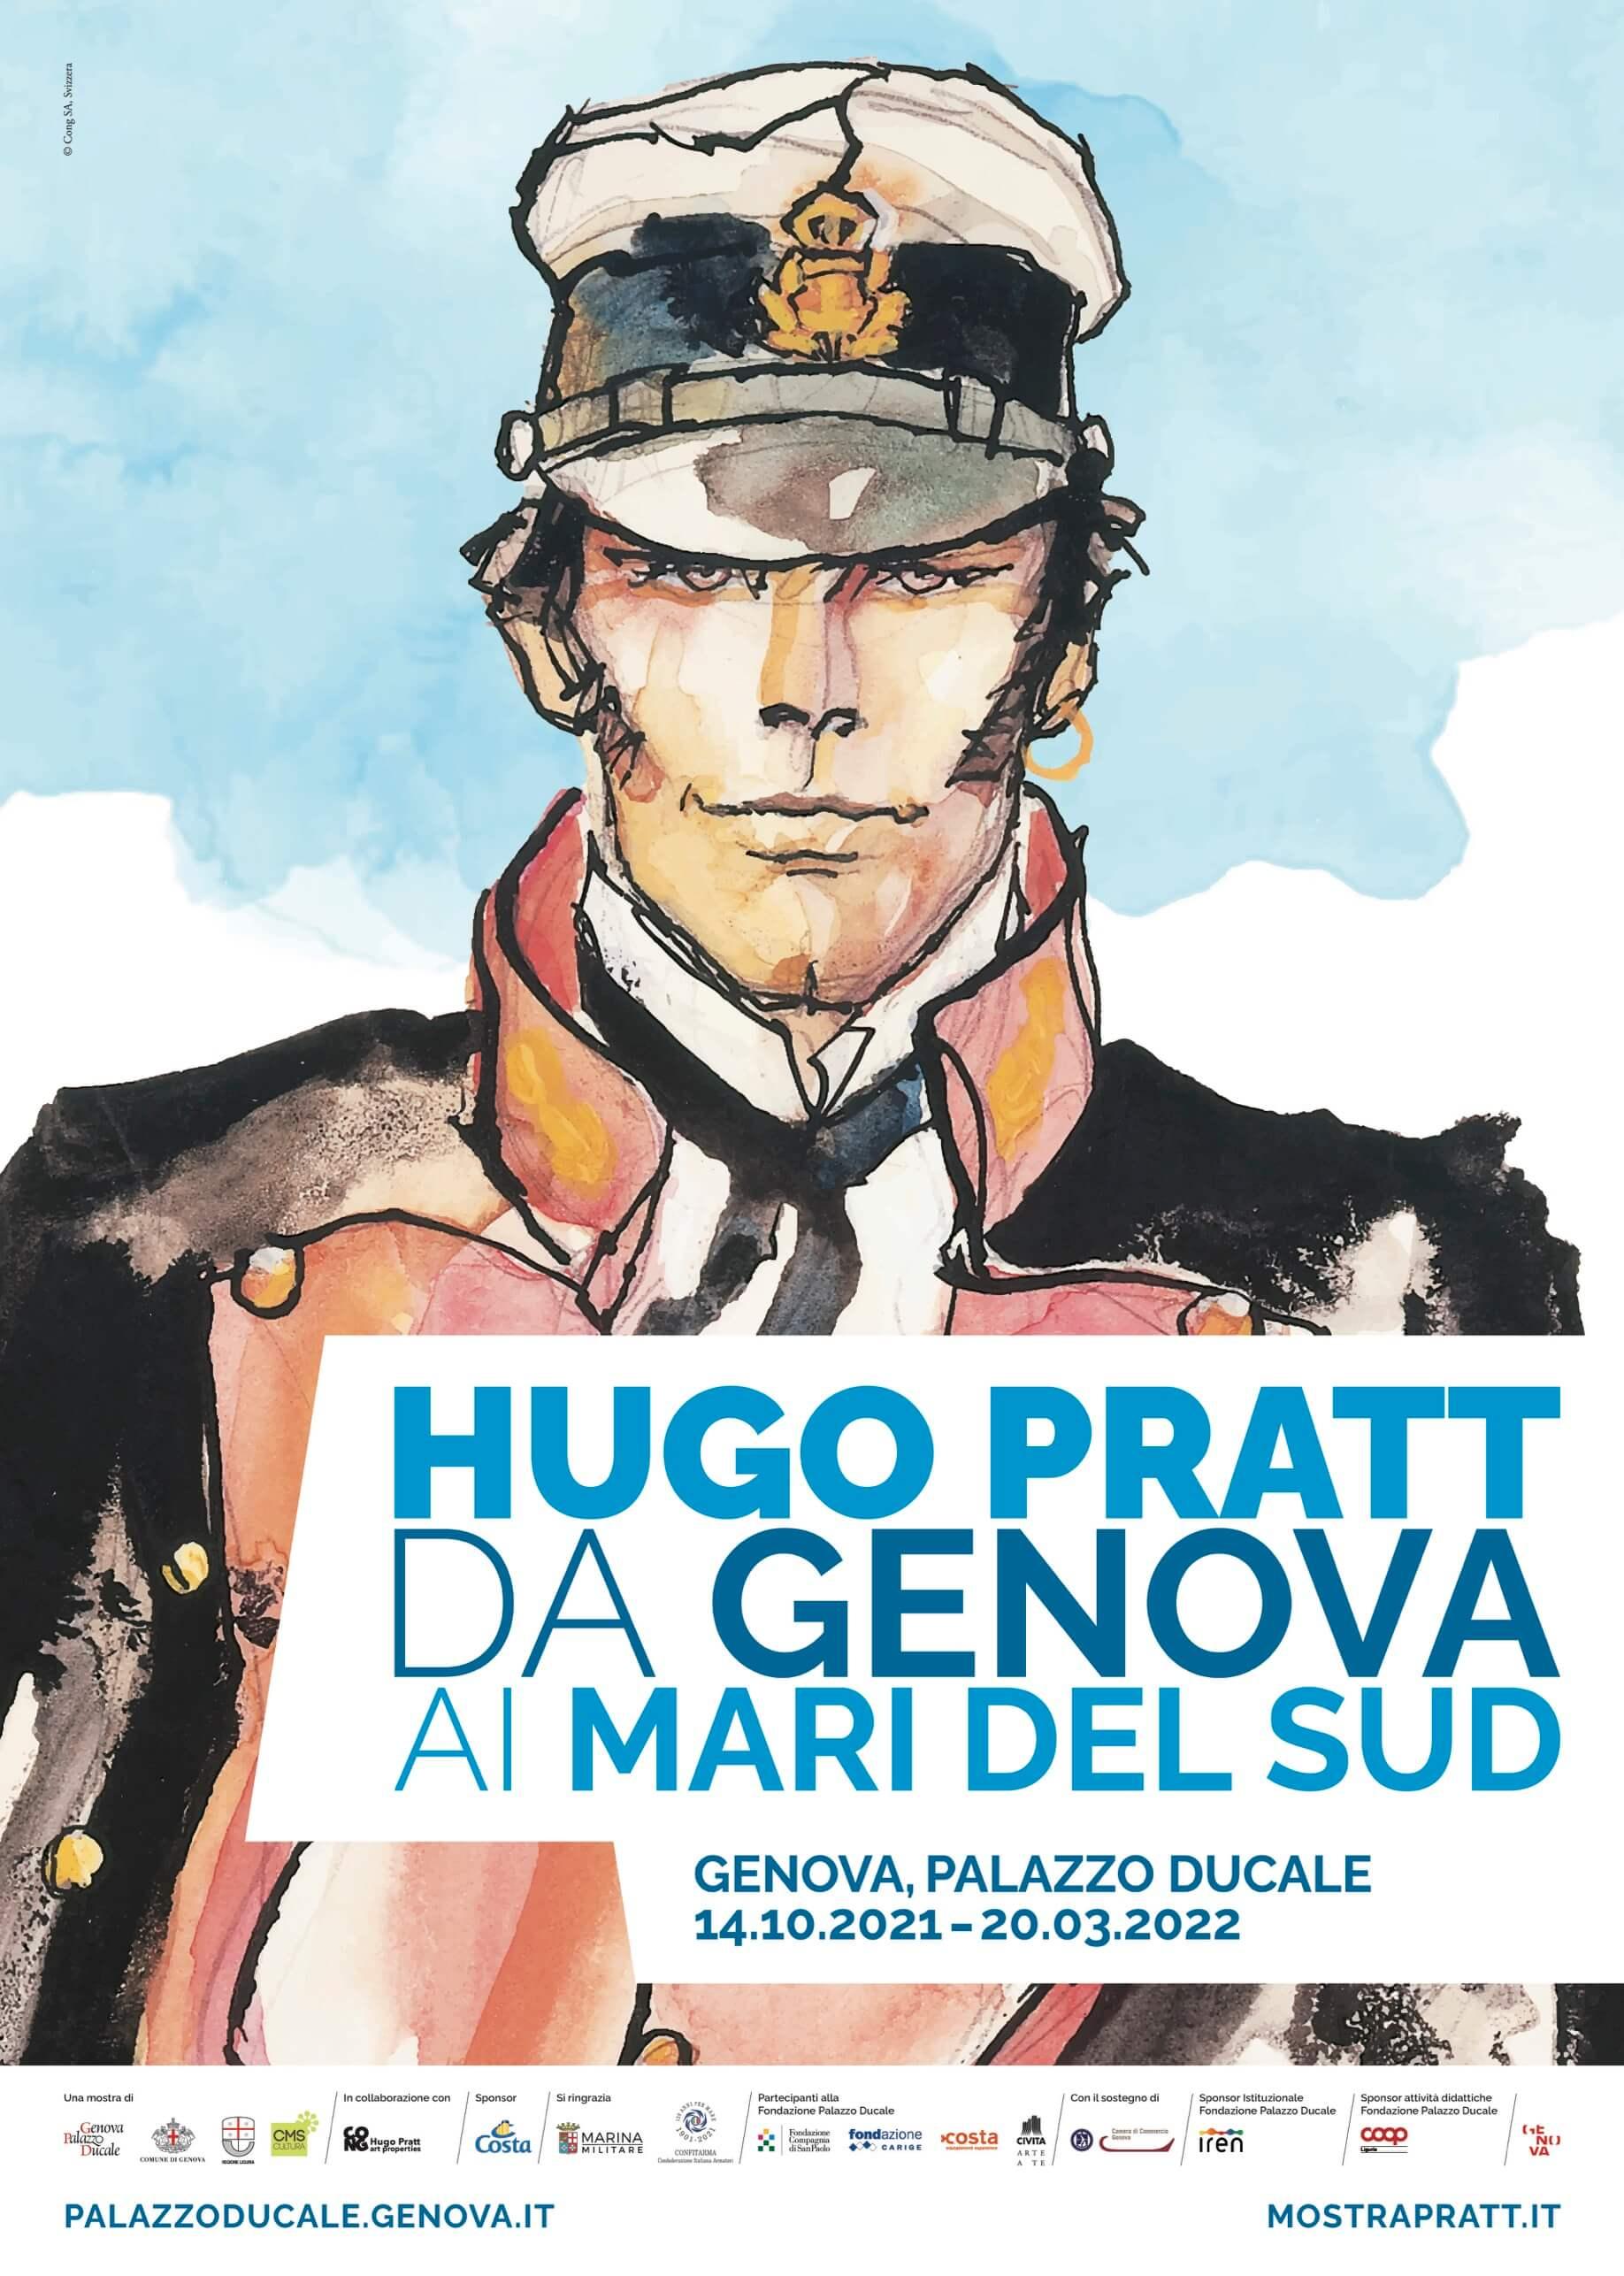 Hugo Pratt Génova